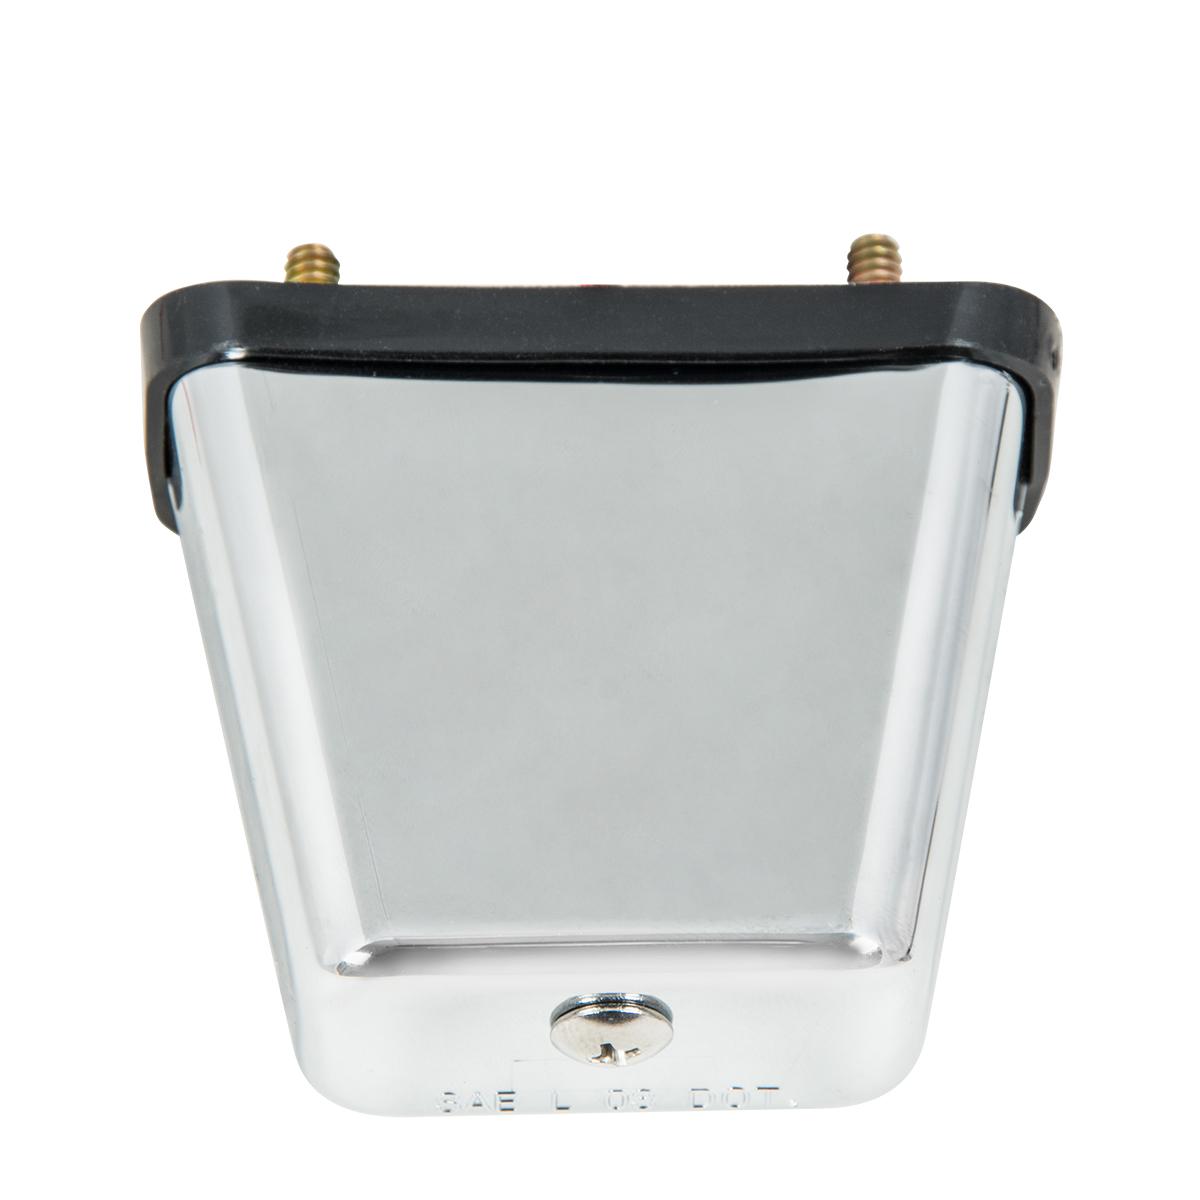 81736 Rectangular License LED Light with 2 Studs